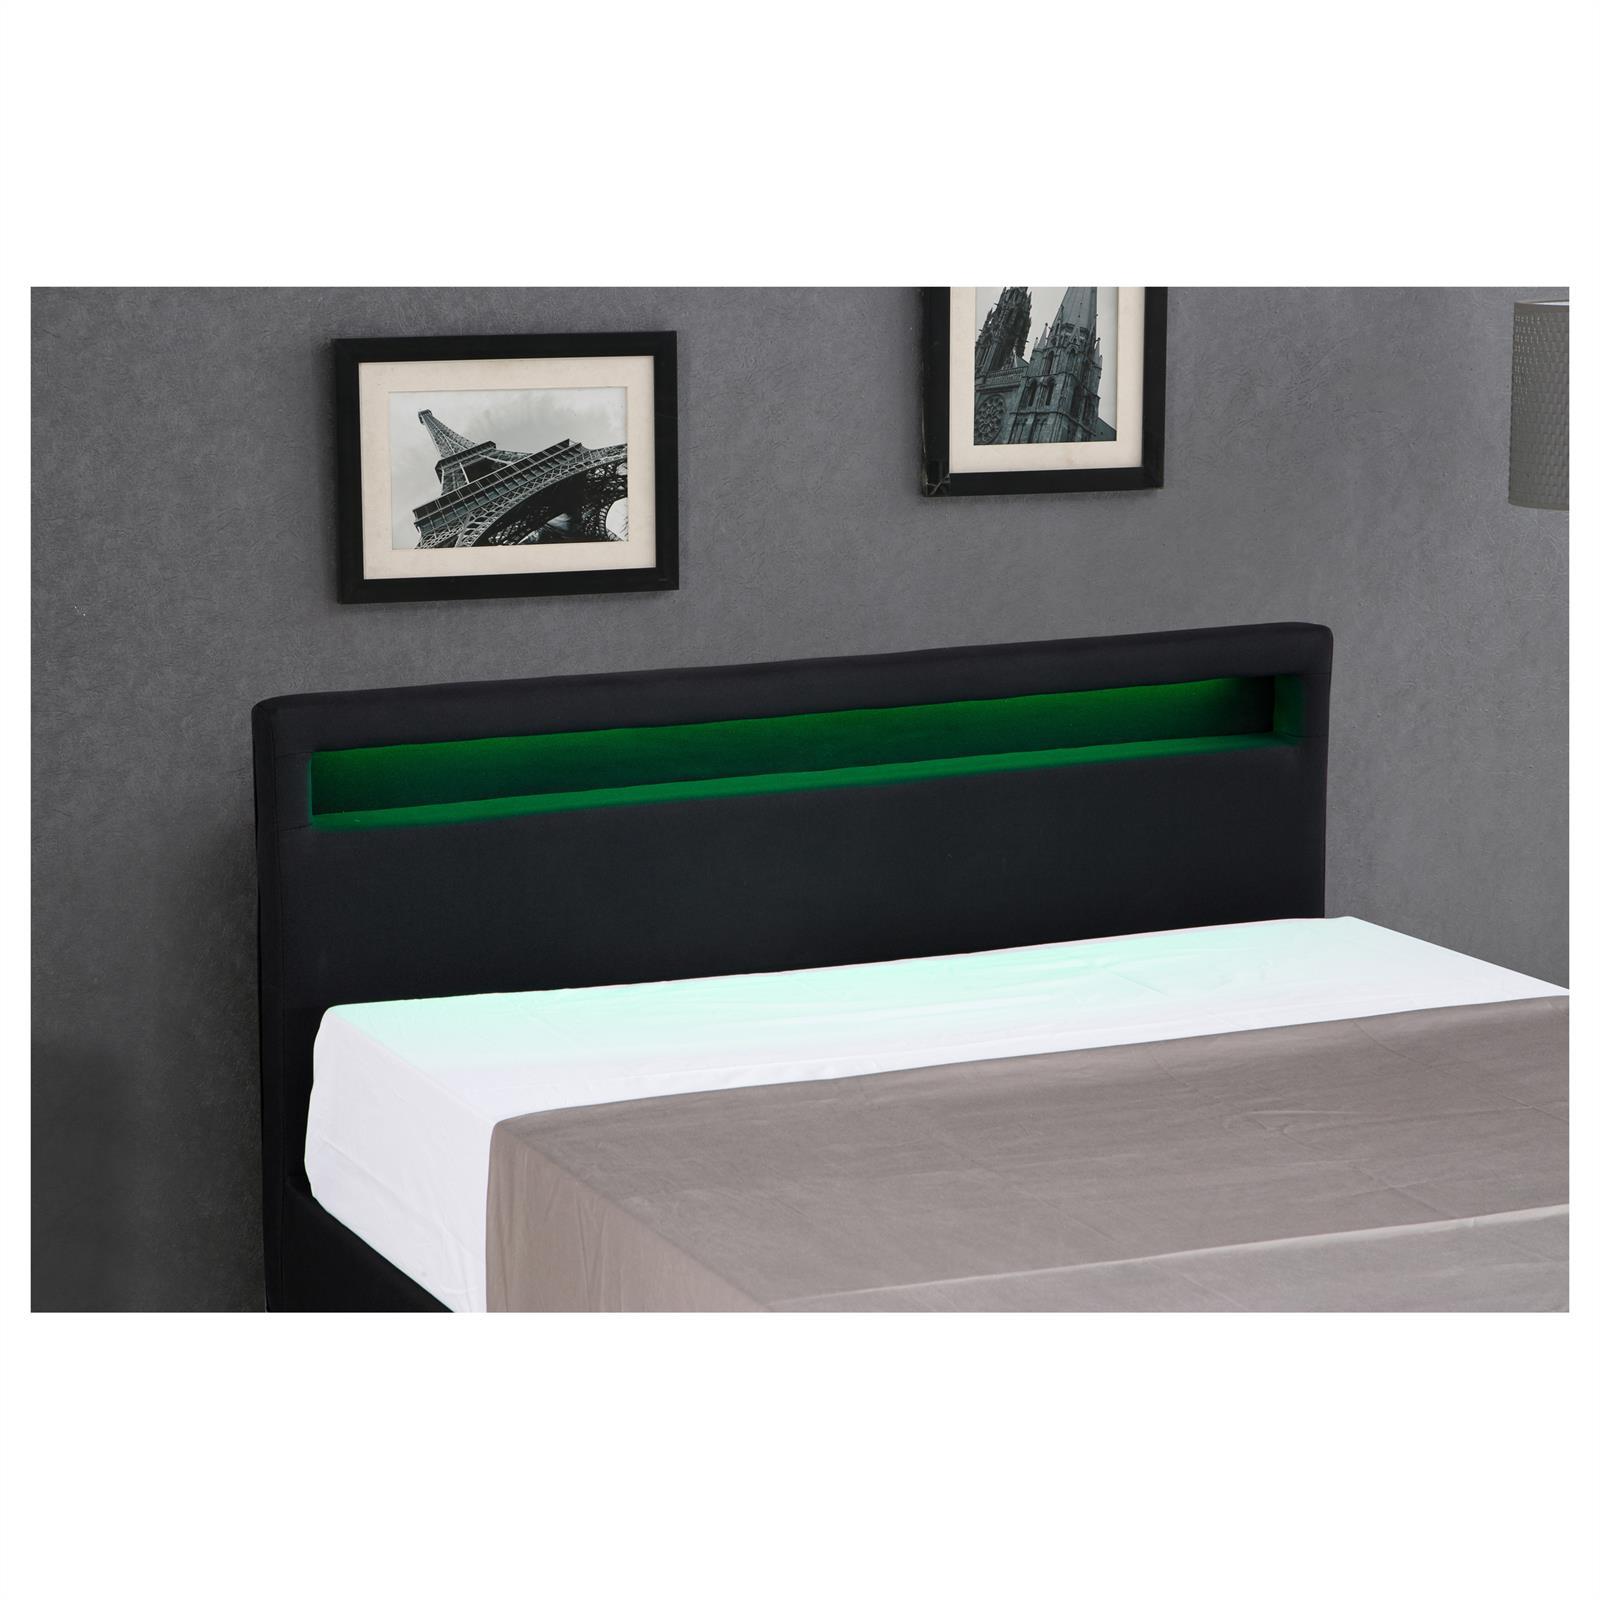 polsterbett satoka mit led 120x200 cm schwarz inkl lattenrost caro m bel. Black Bedroom Furniture Sets. Home Design Ideas